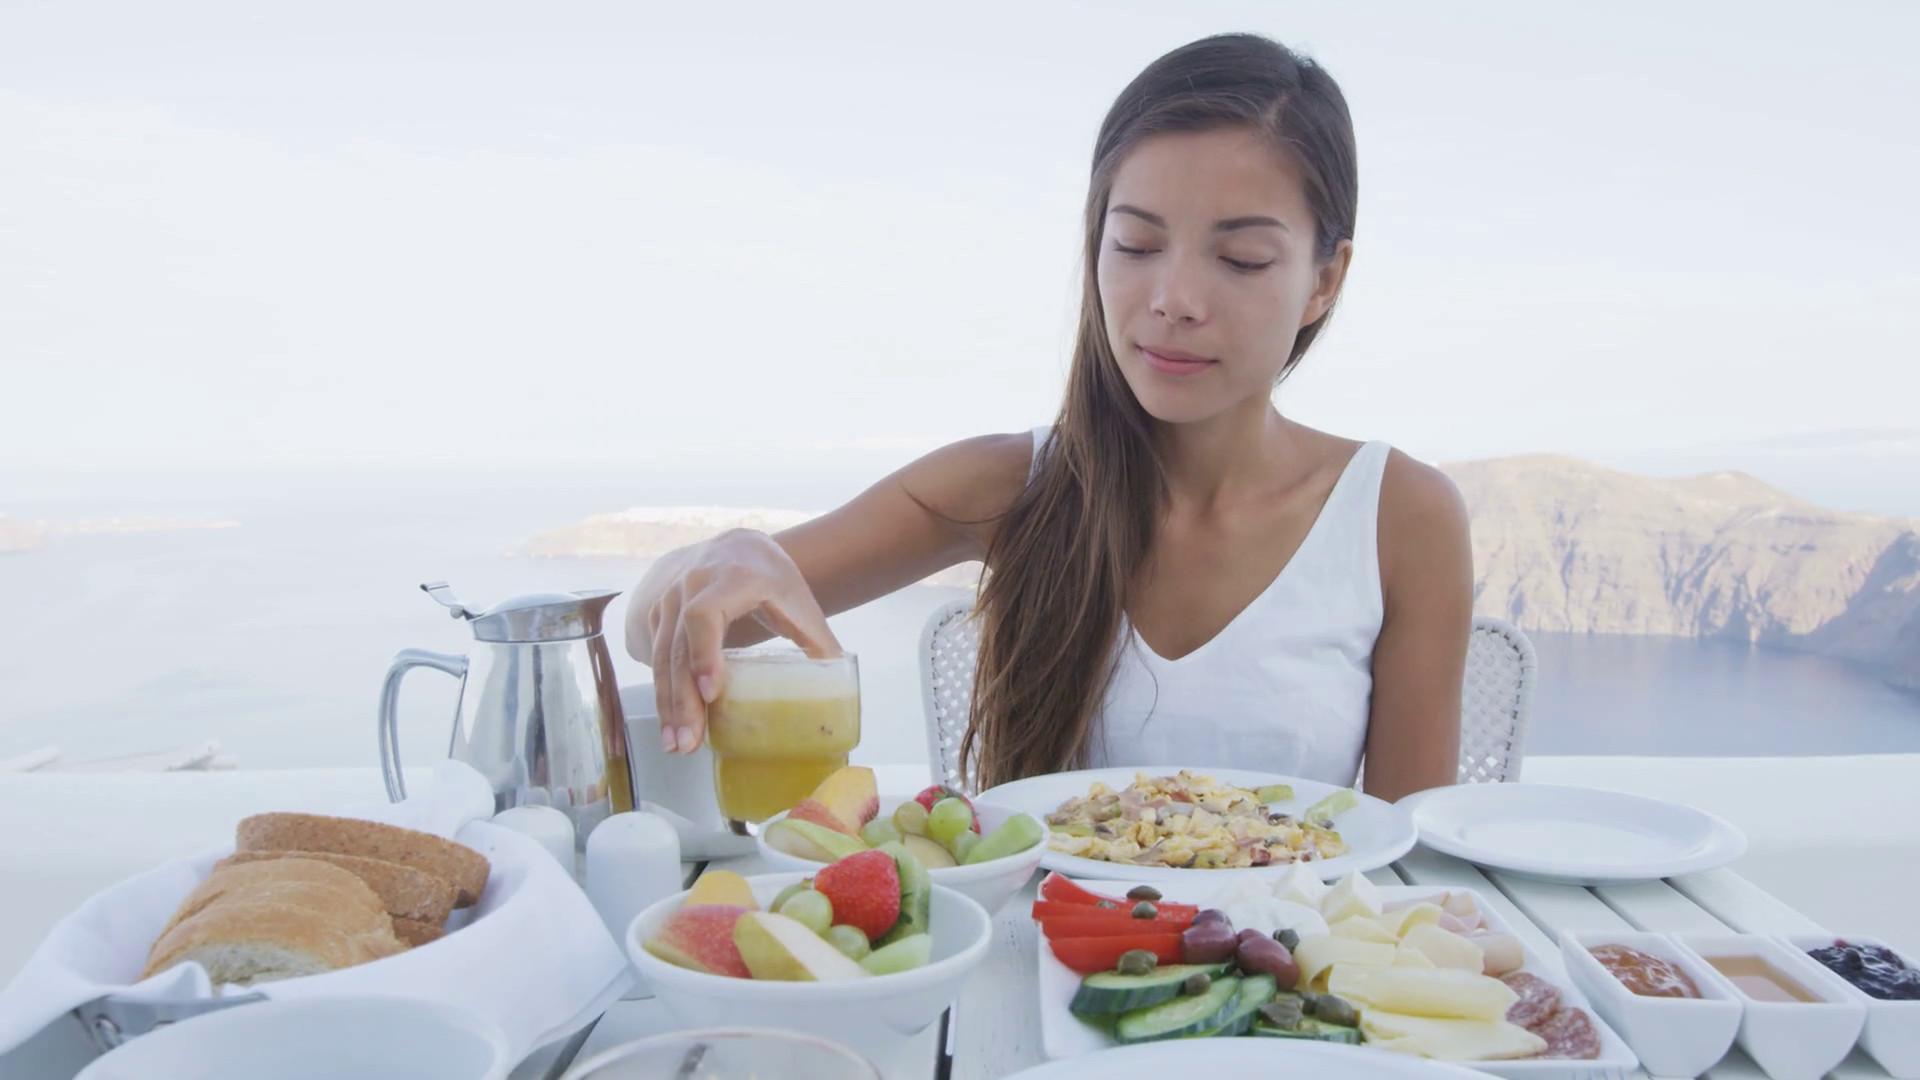 Healthy Eating Breakfast  Asian woman eating breakfast Female tourist having glass